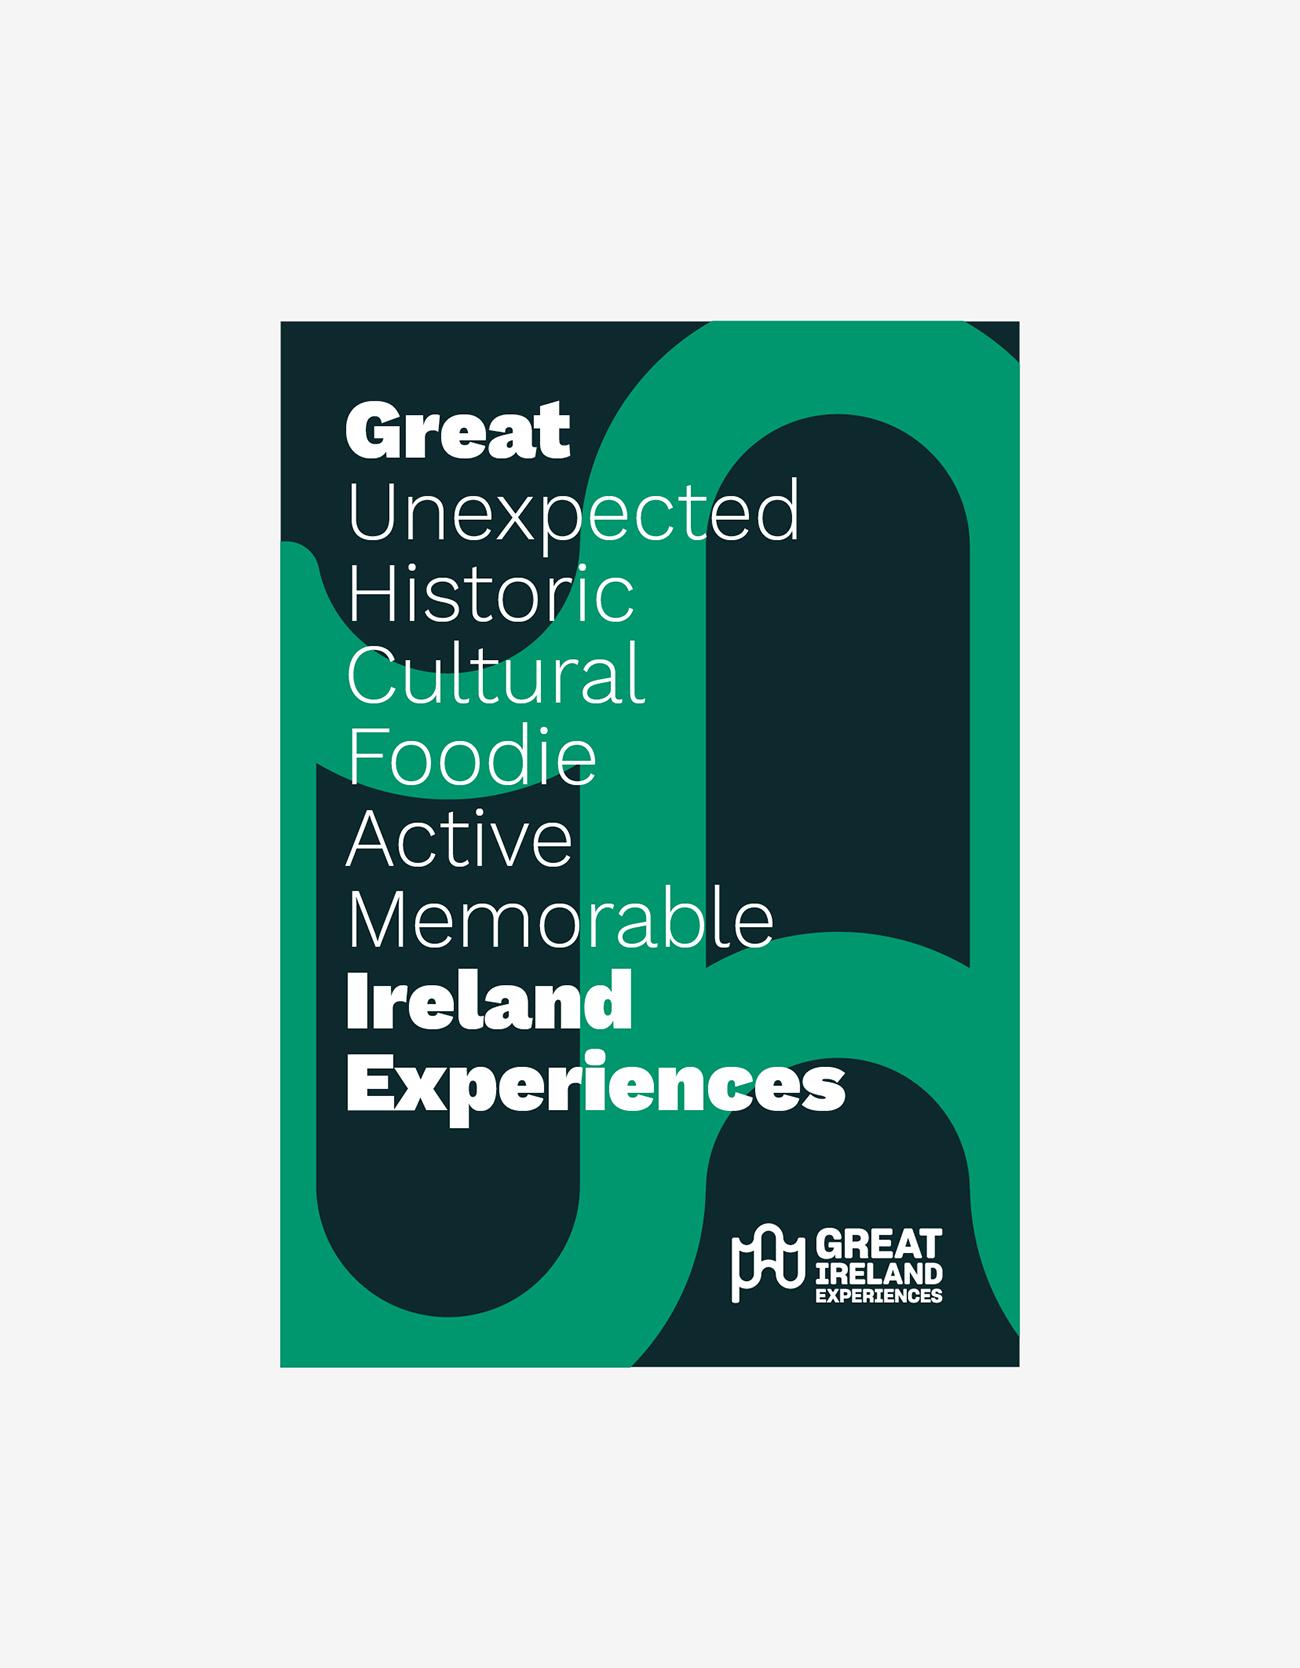 Great Ireland Experiences Brand Development